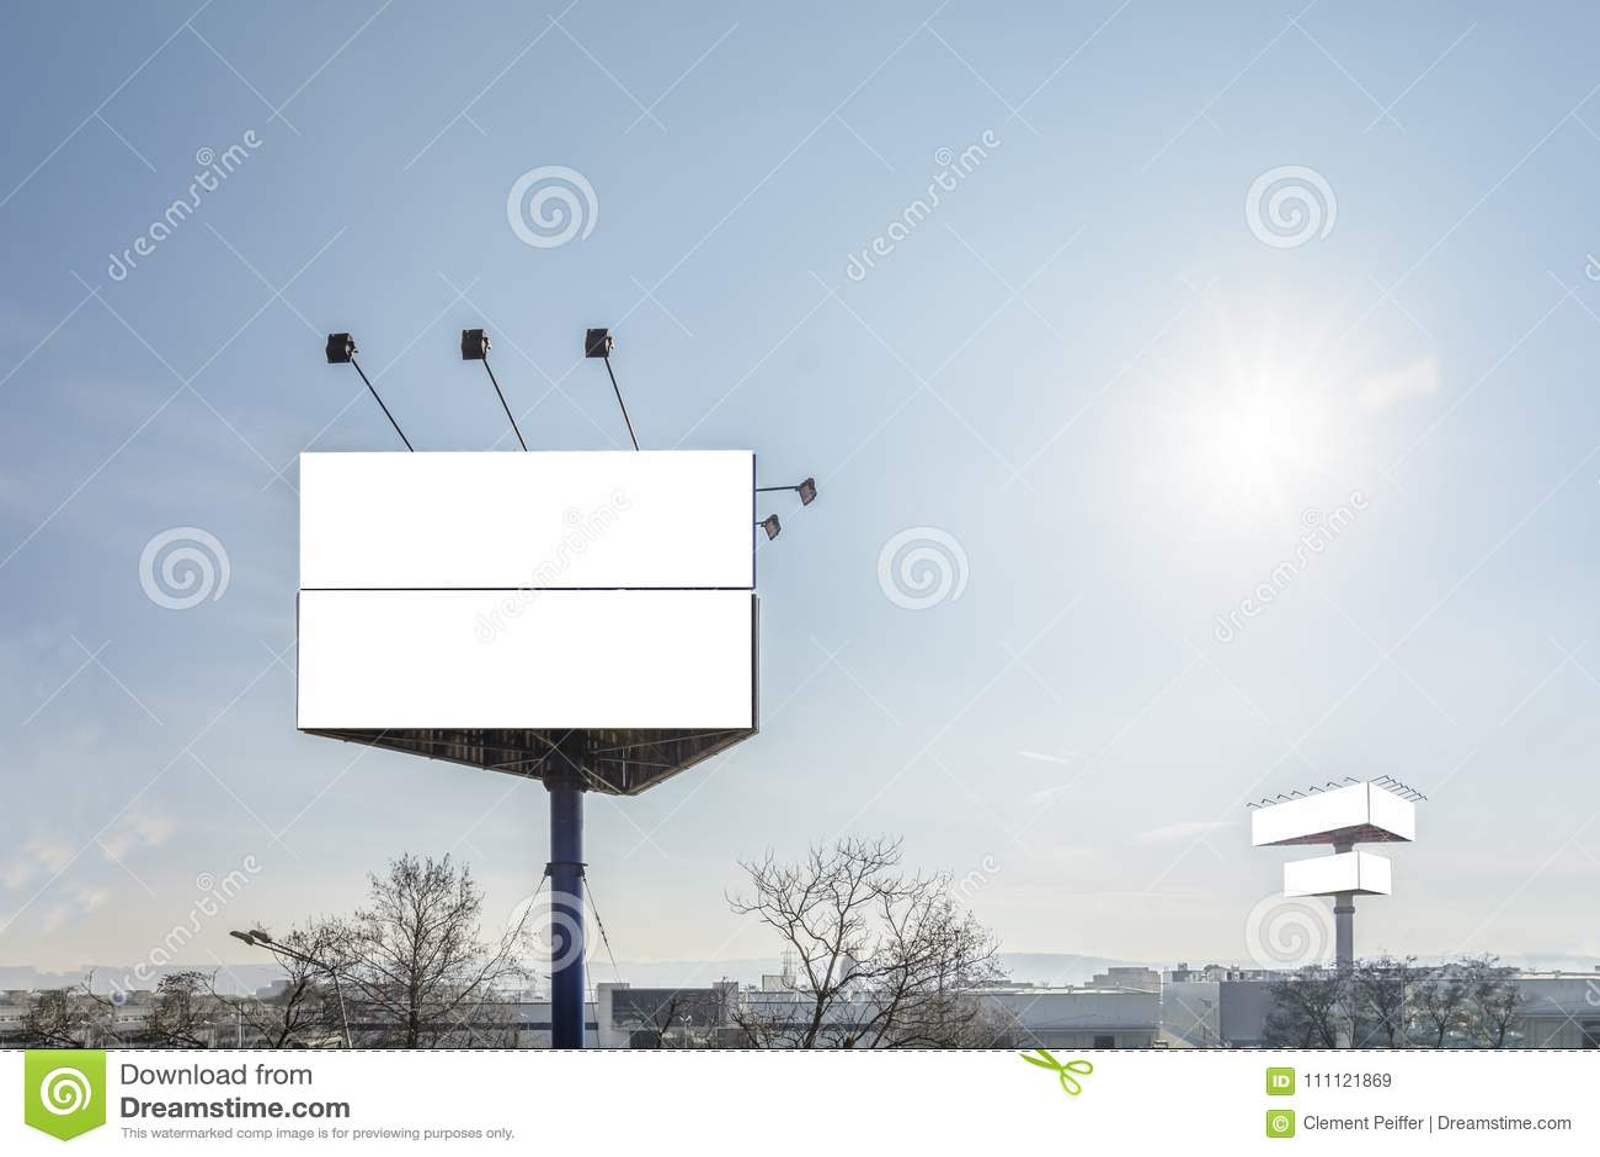 Triangle billboard